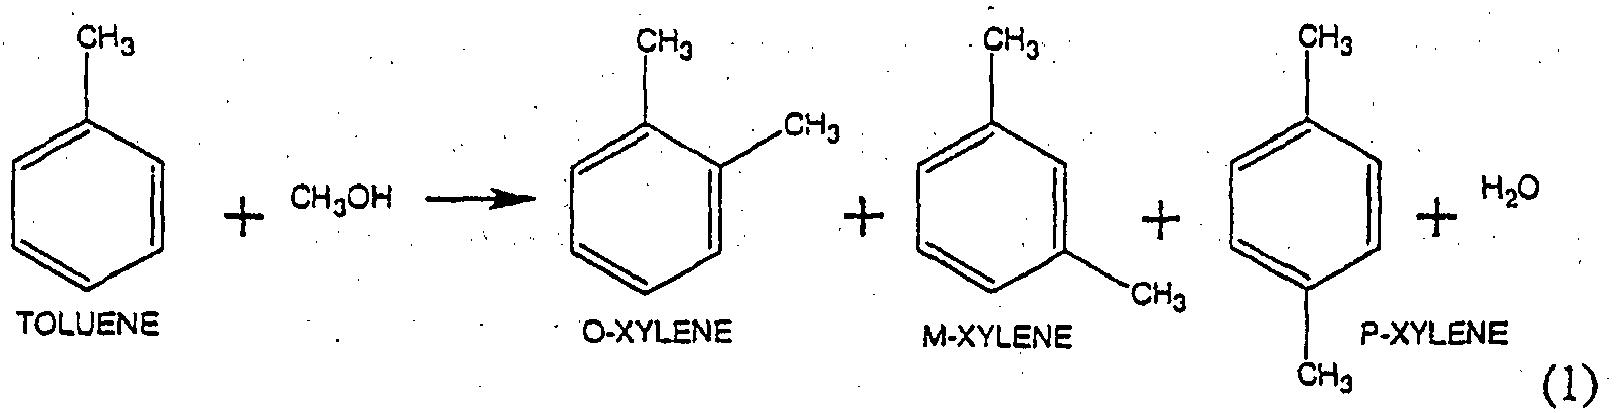 EP1675808B1 - Toluene methylation process - Google Patents